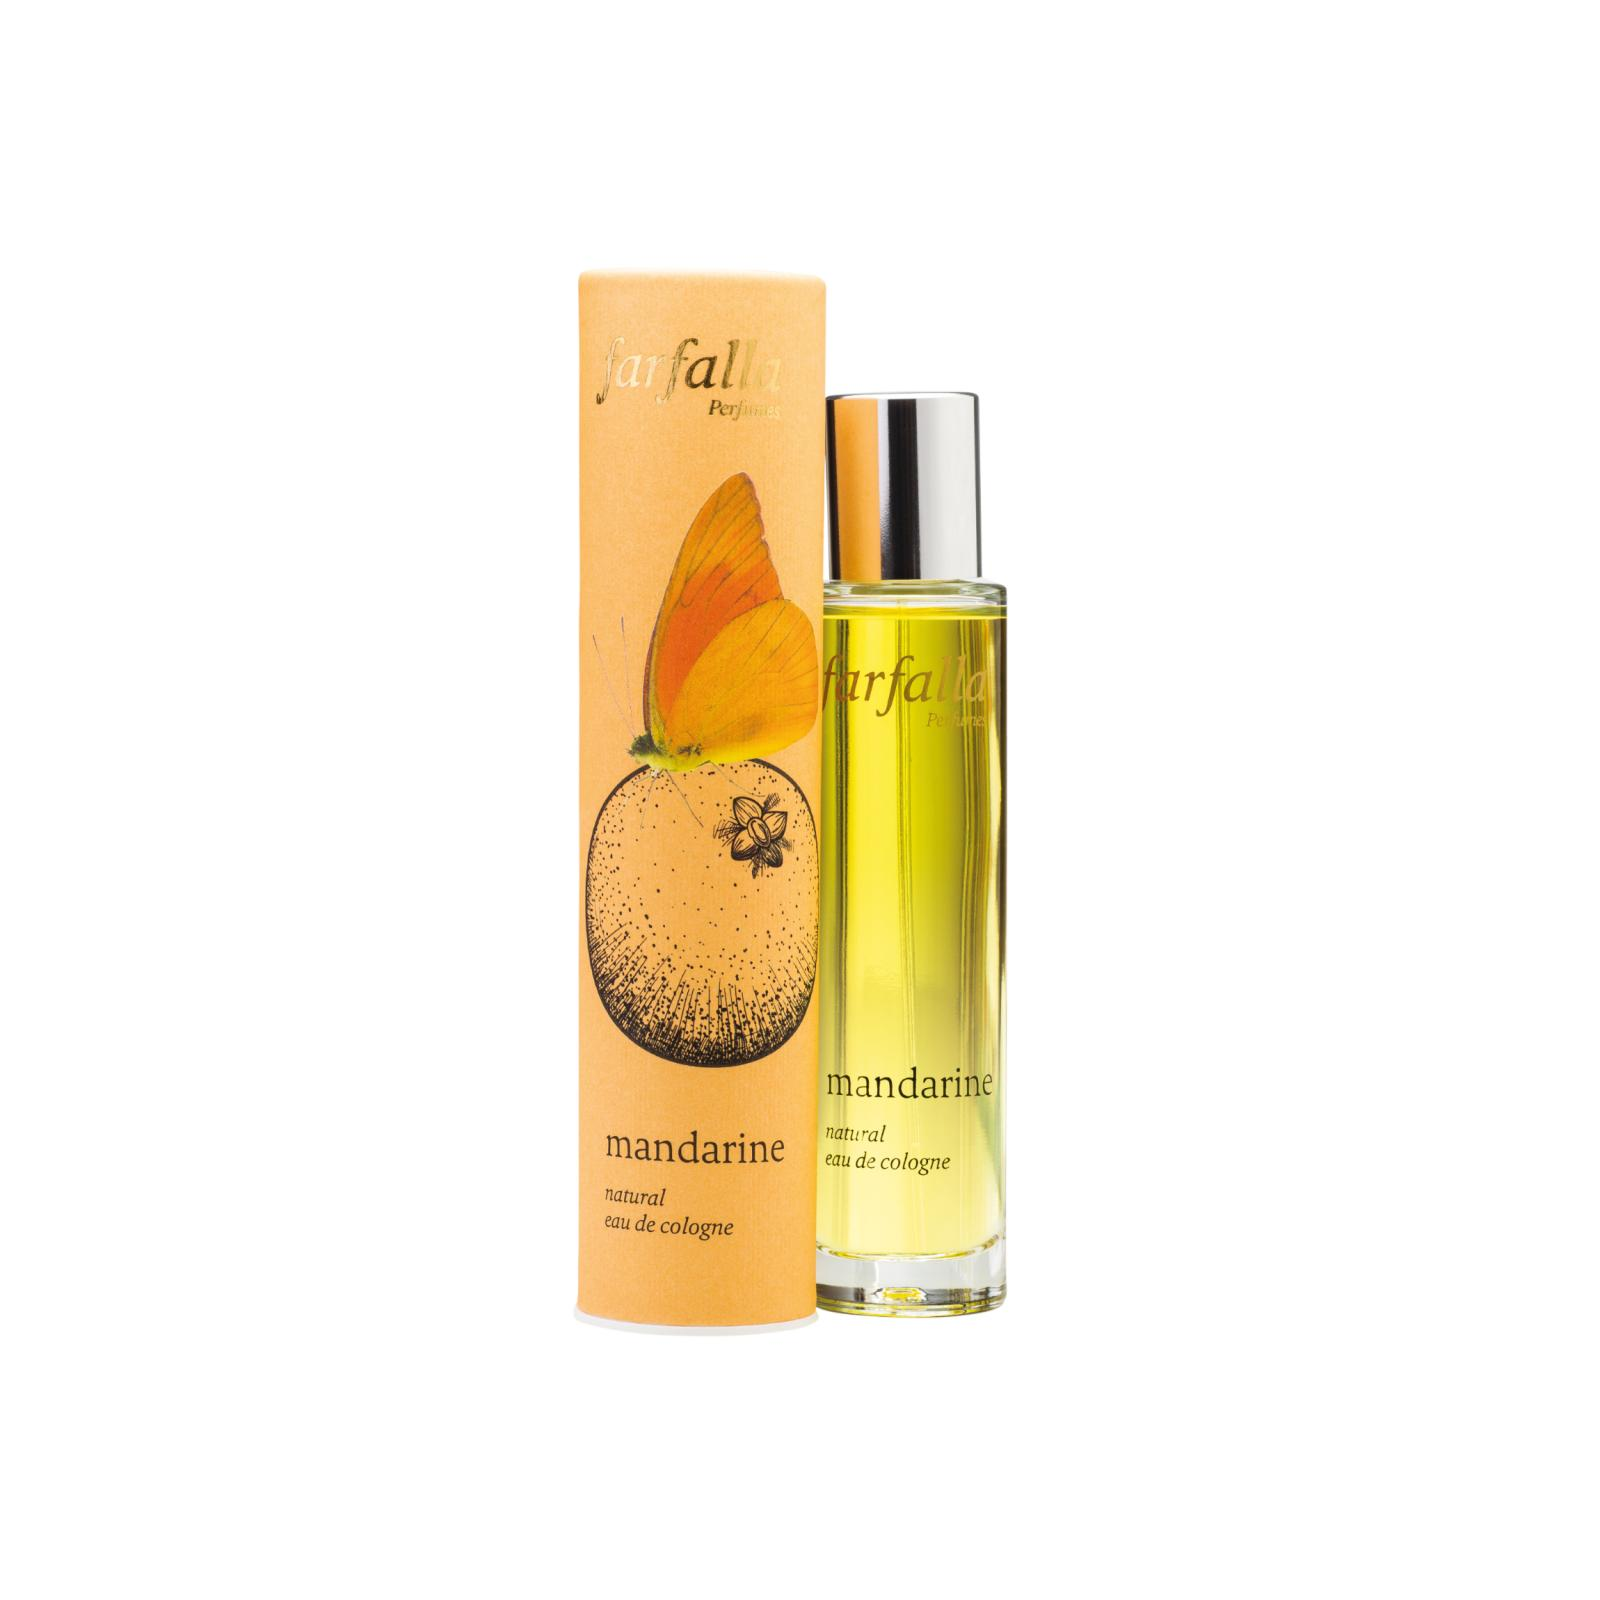 Farfalla Kolínská voda Mandarine, Dolce Vita 50 ml